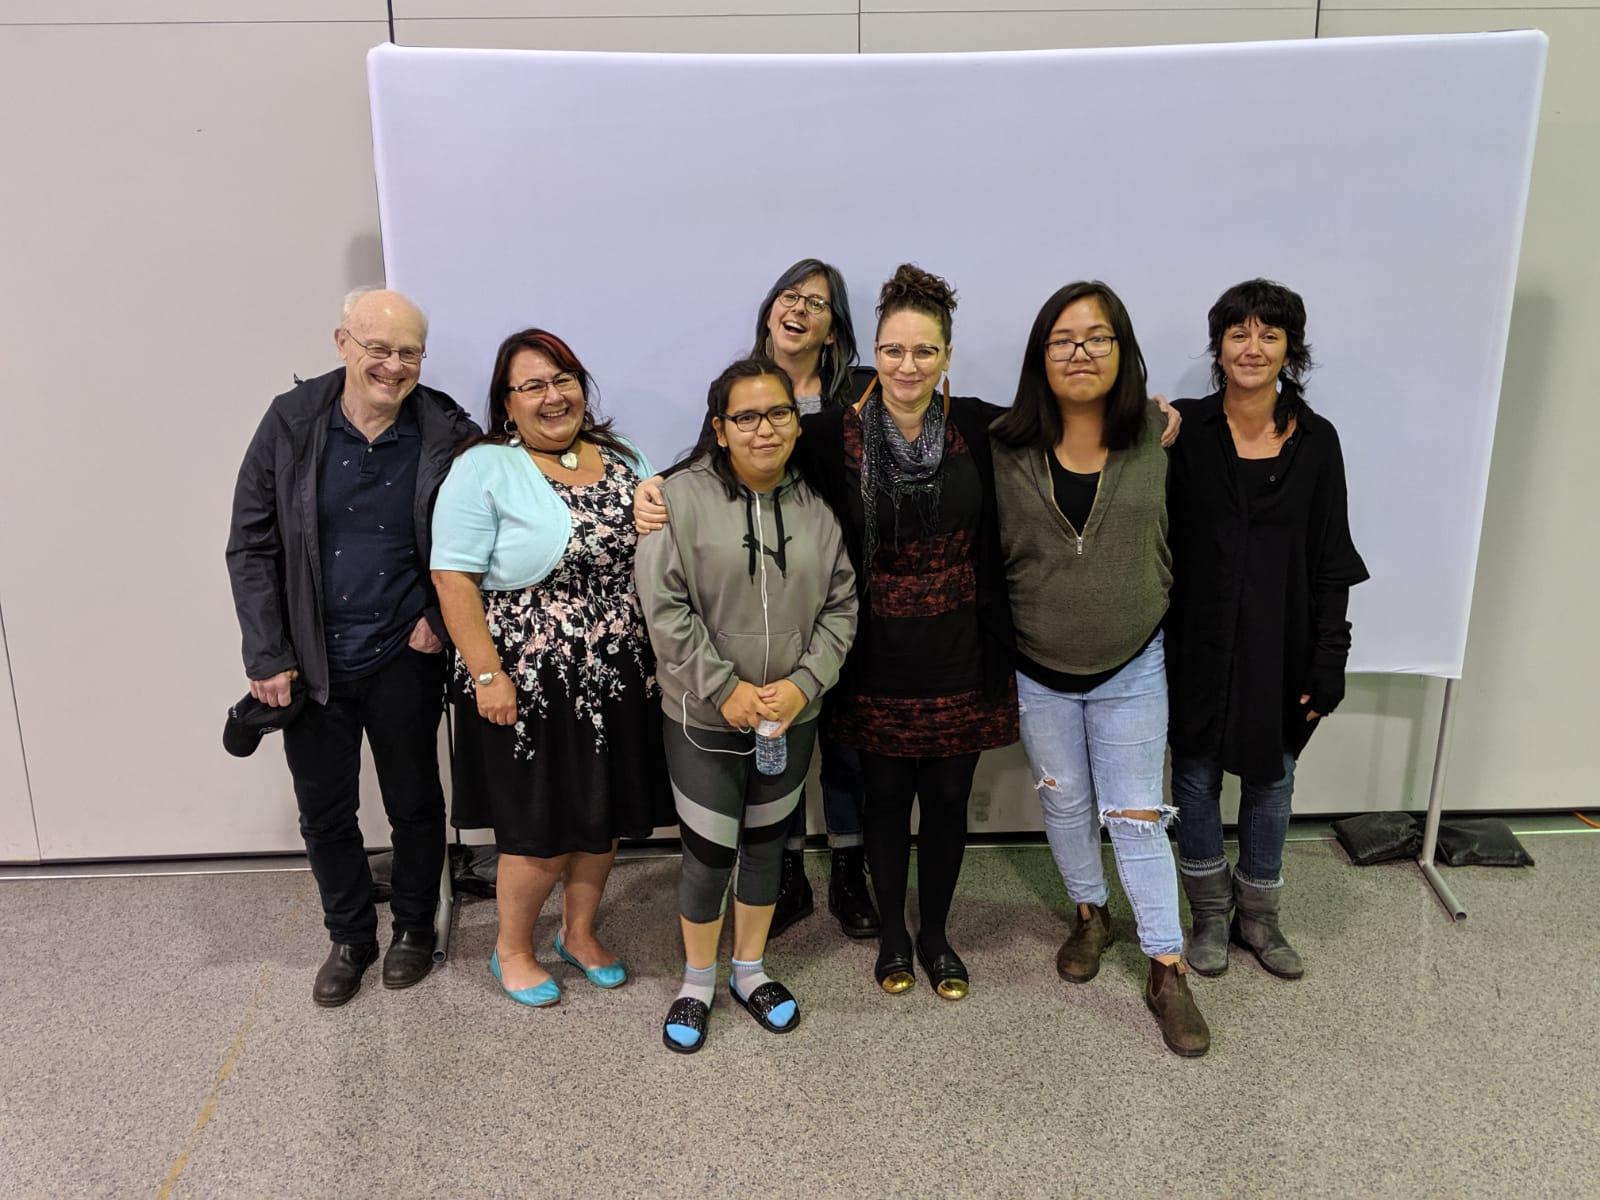 Left to right Peter, Leah, Kelly, Lisa g, Odessa, Roberta & Sebnem